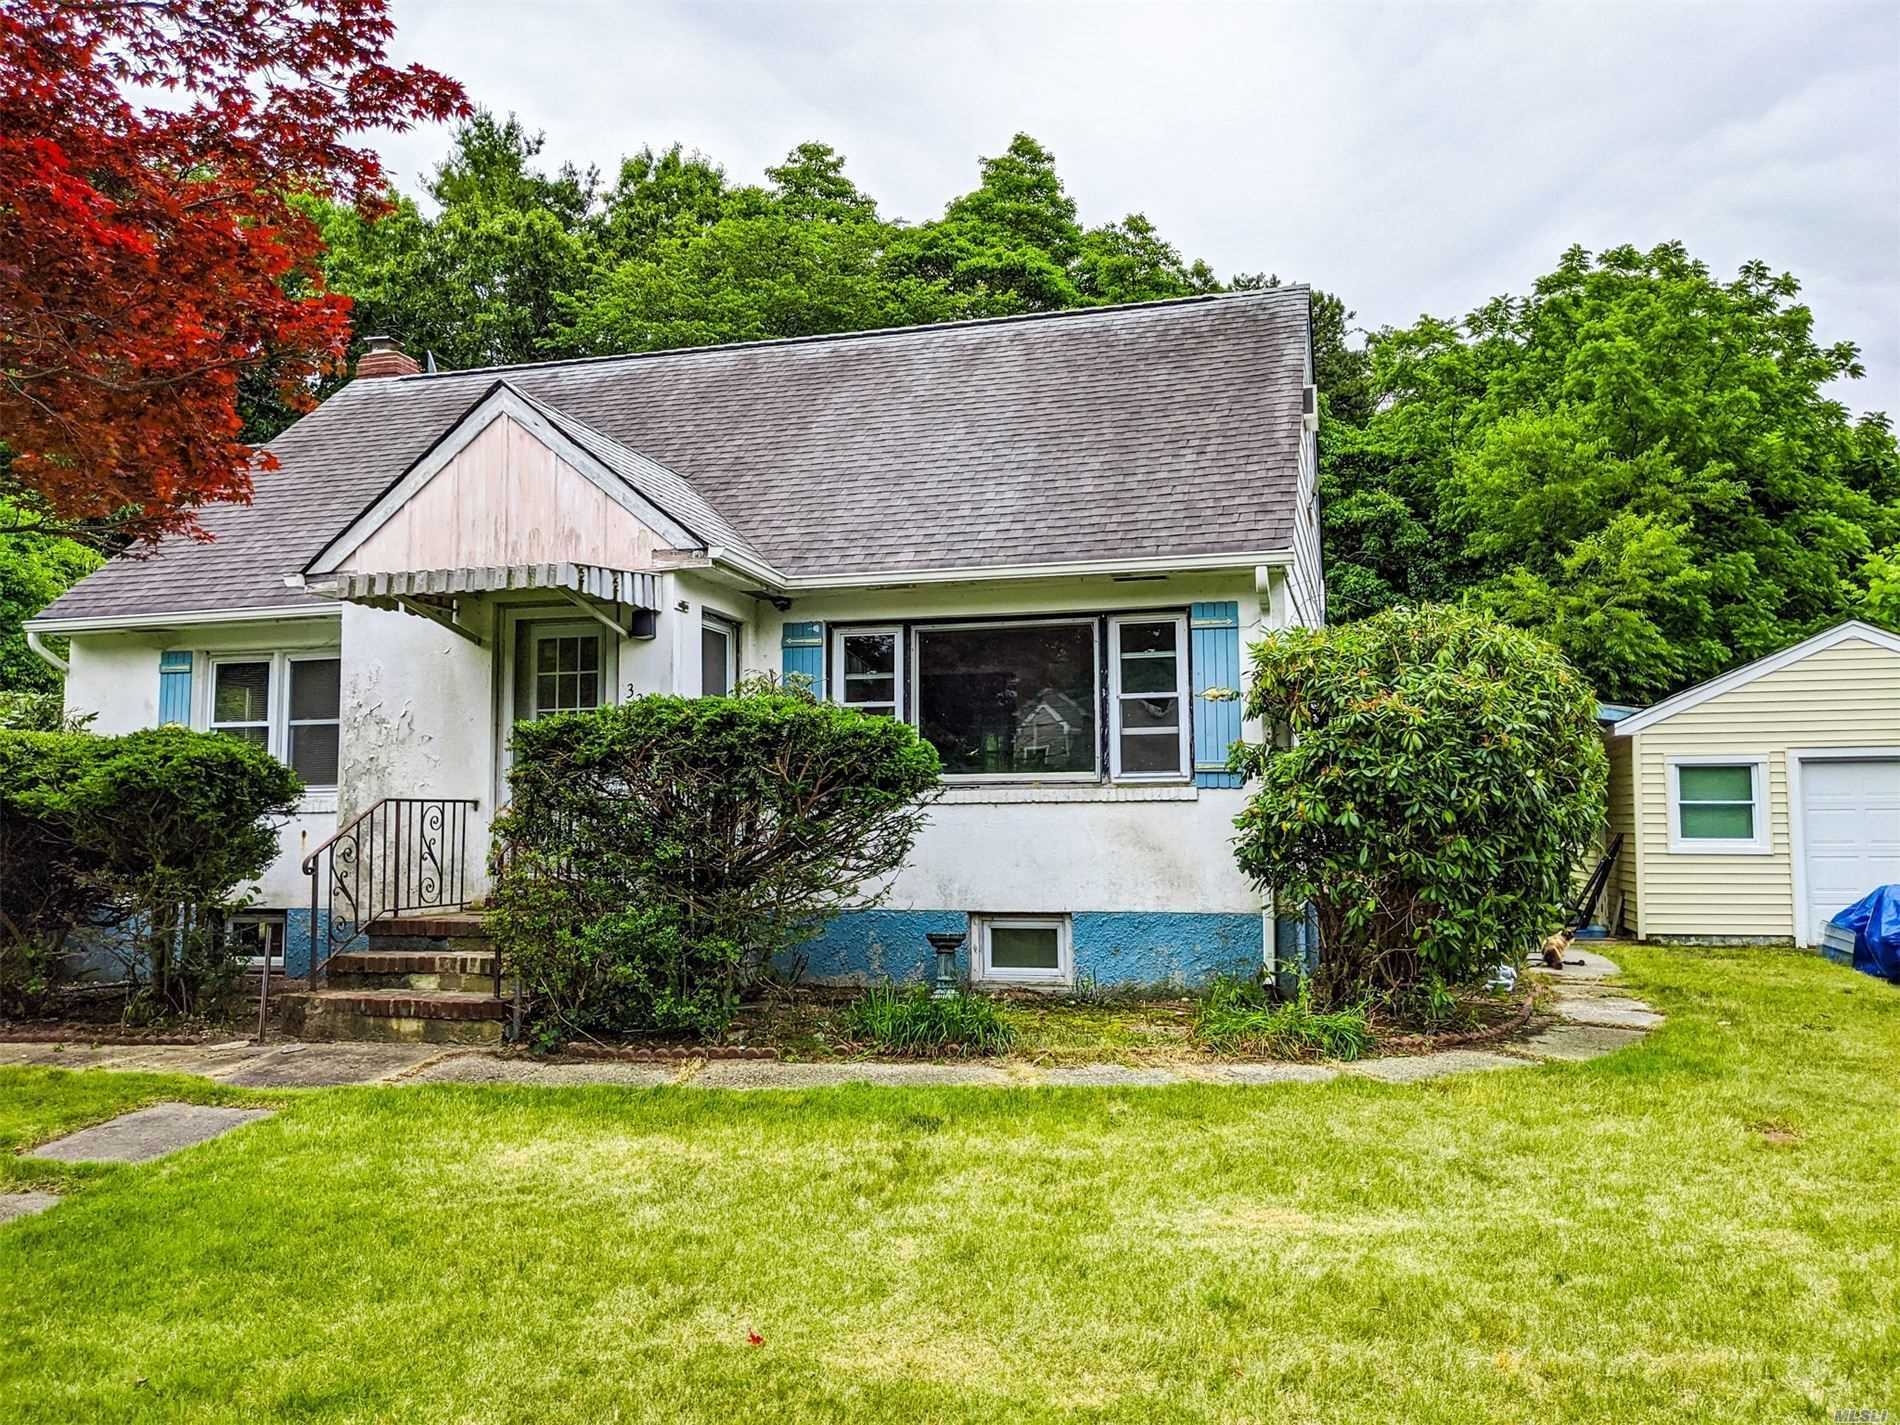 32 Smith Lane, Middle Island, NY 11953 - MLS#: 3232181